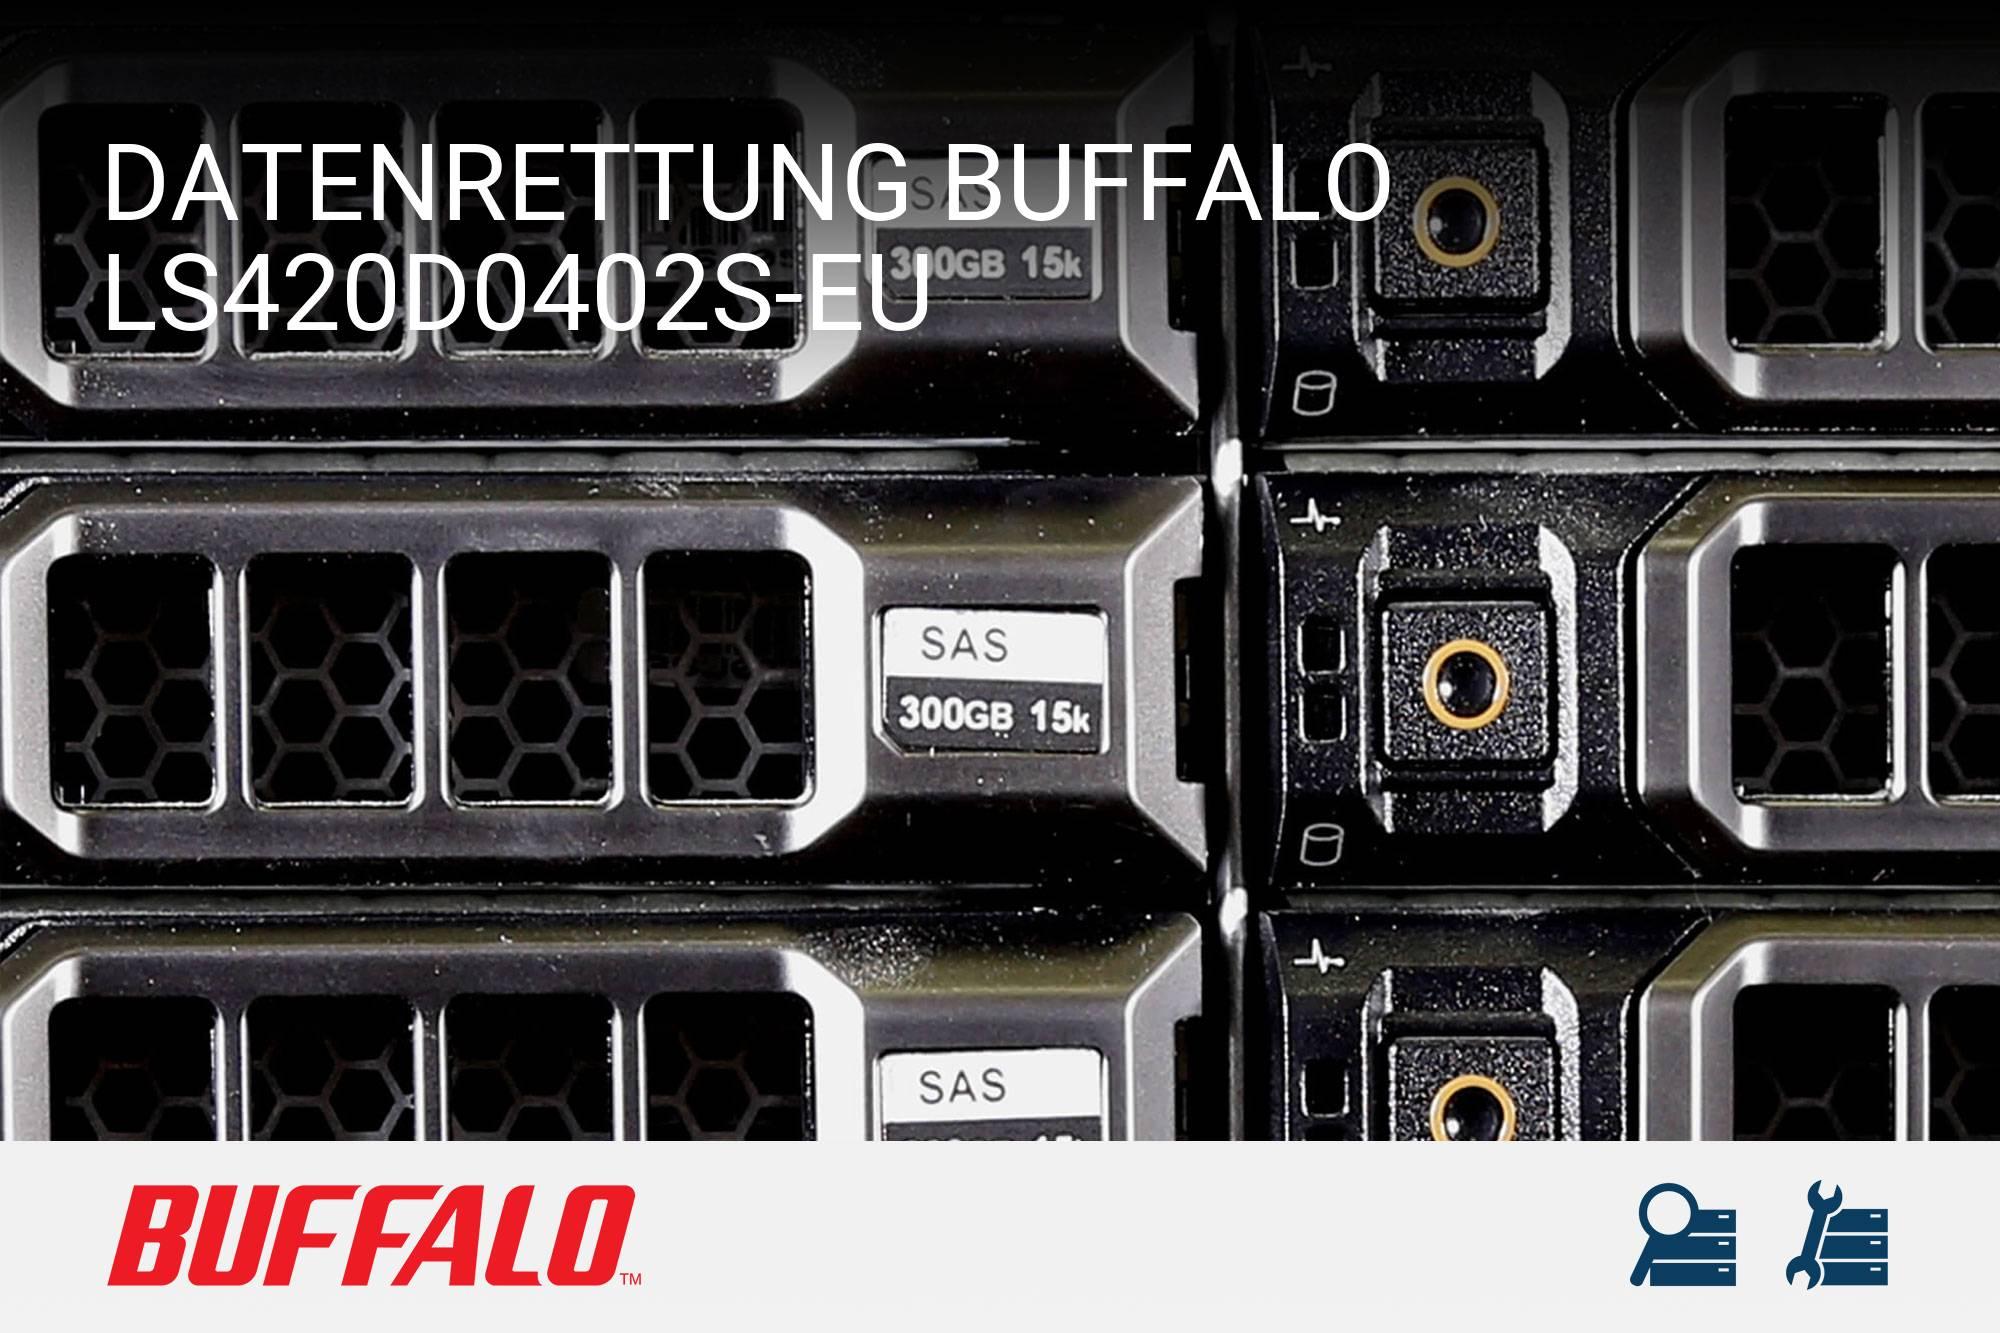 Buffalo LS420D0402S-EU